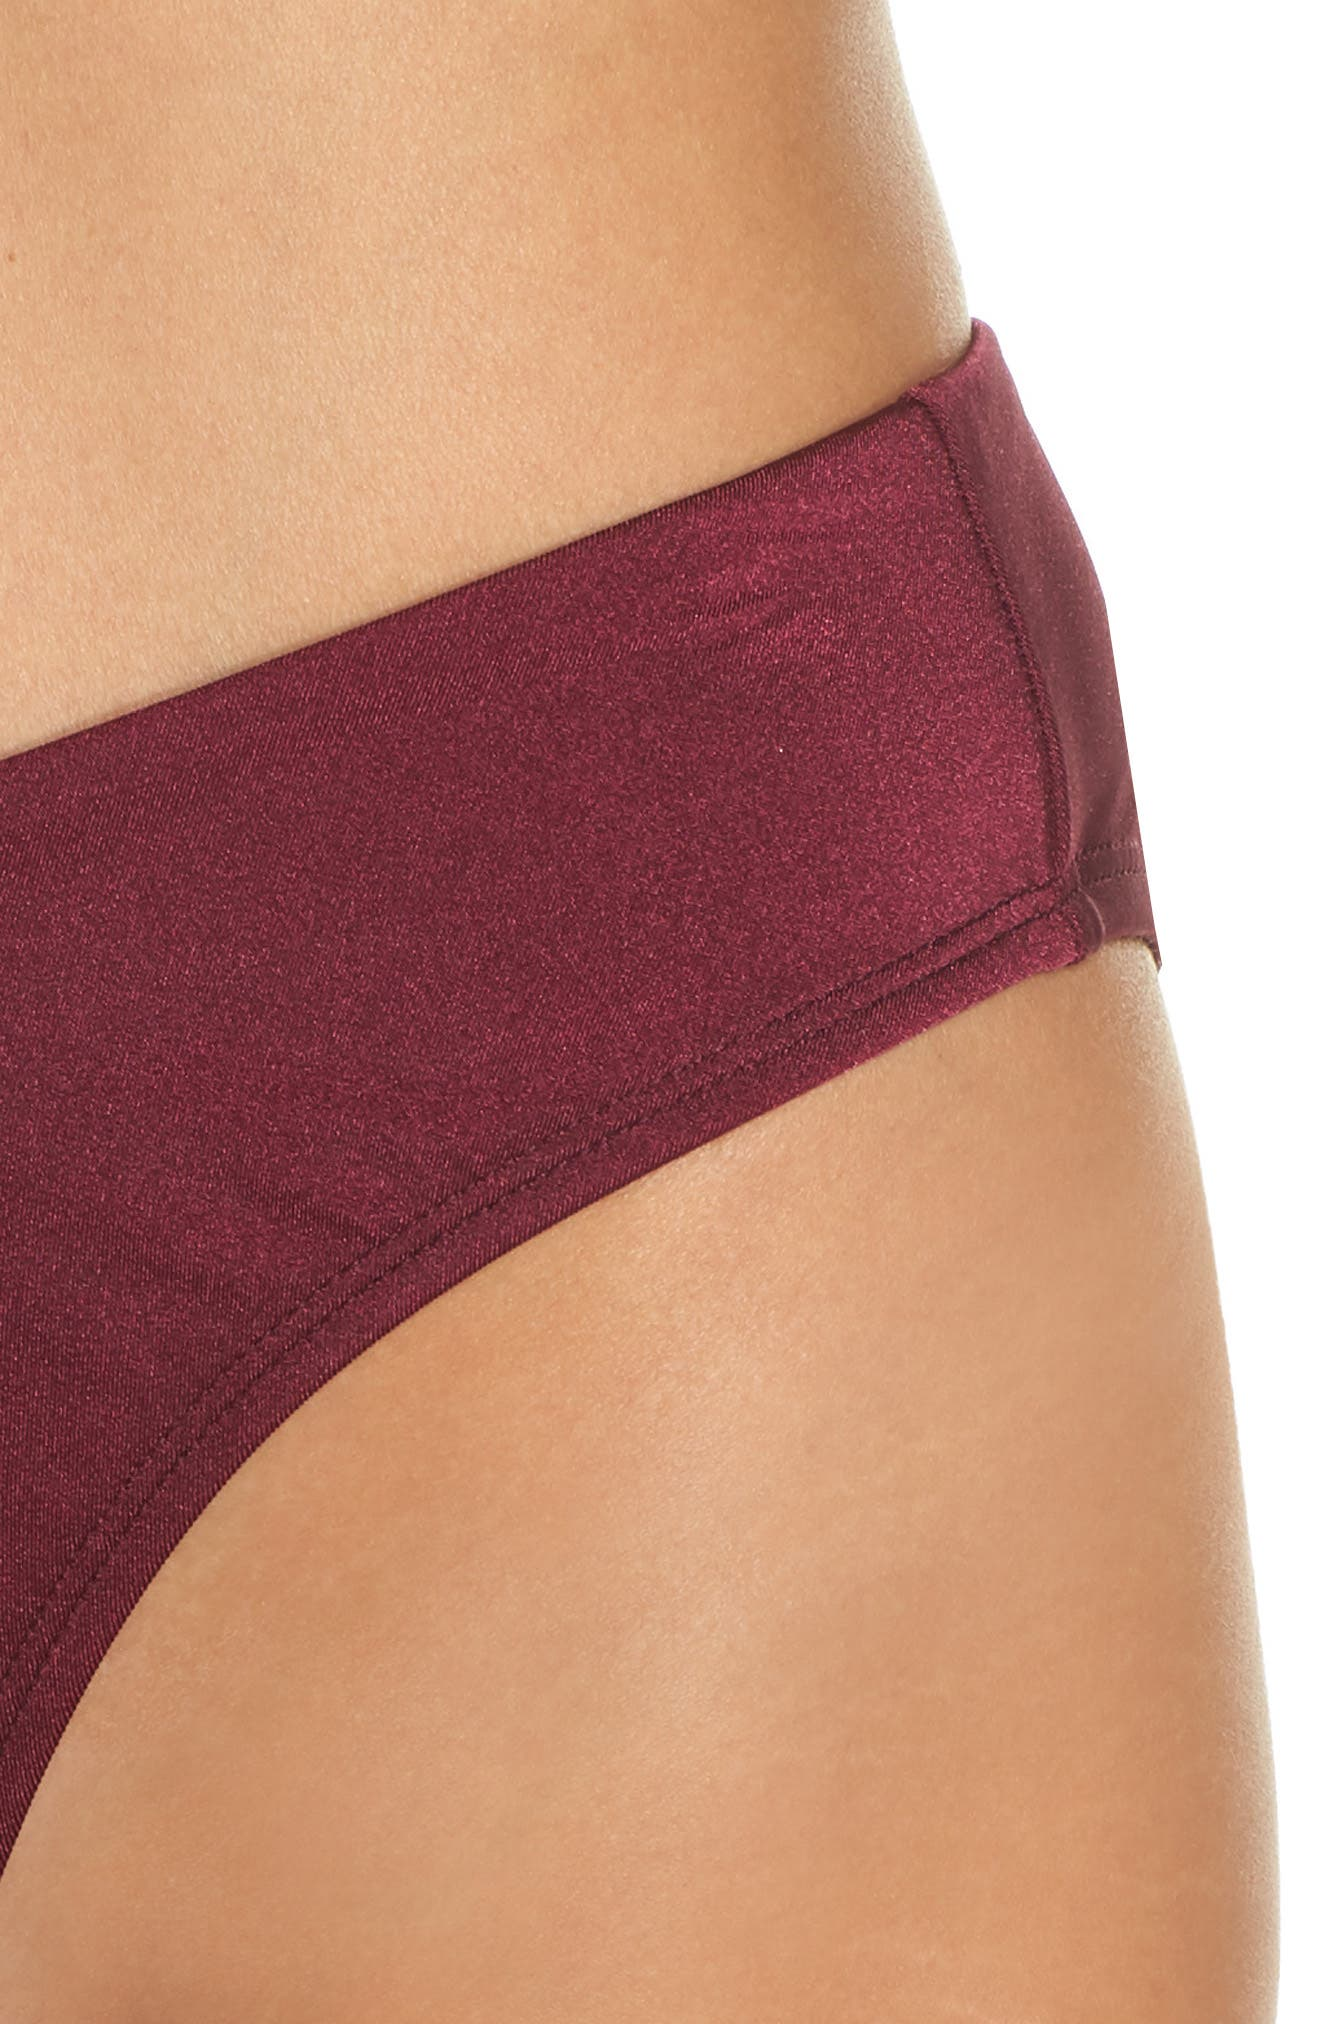 Riviera High Waist Bikini Bottoms,                             Alternate thumbnail 4, color,                             BURGUNDY FIELD